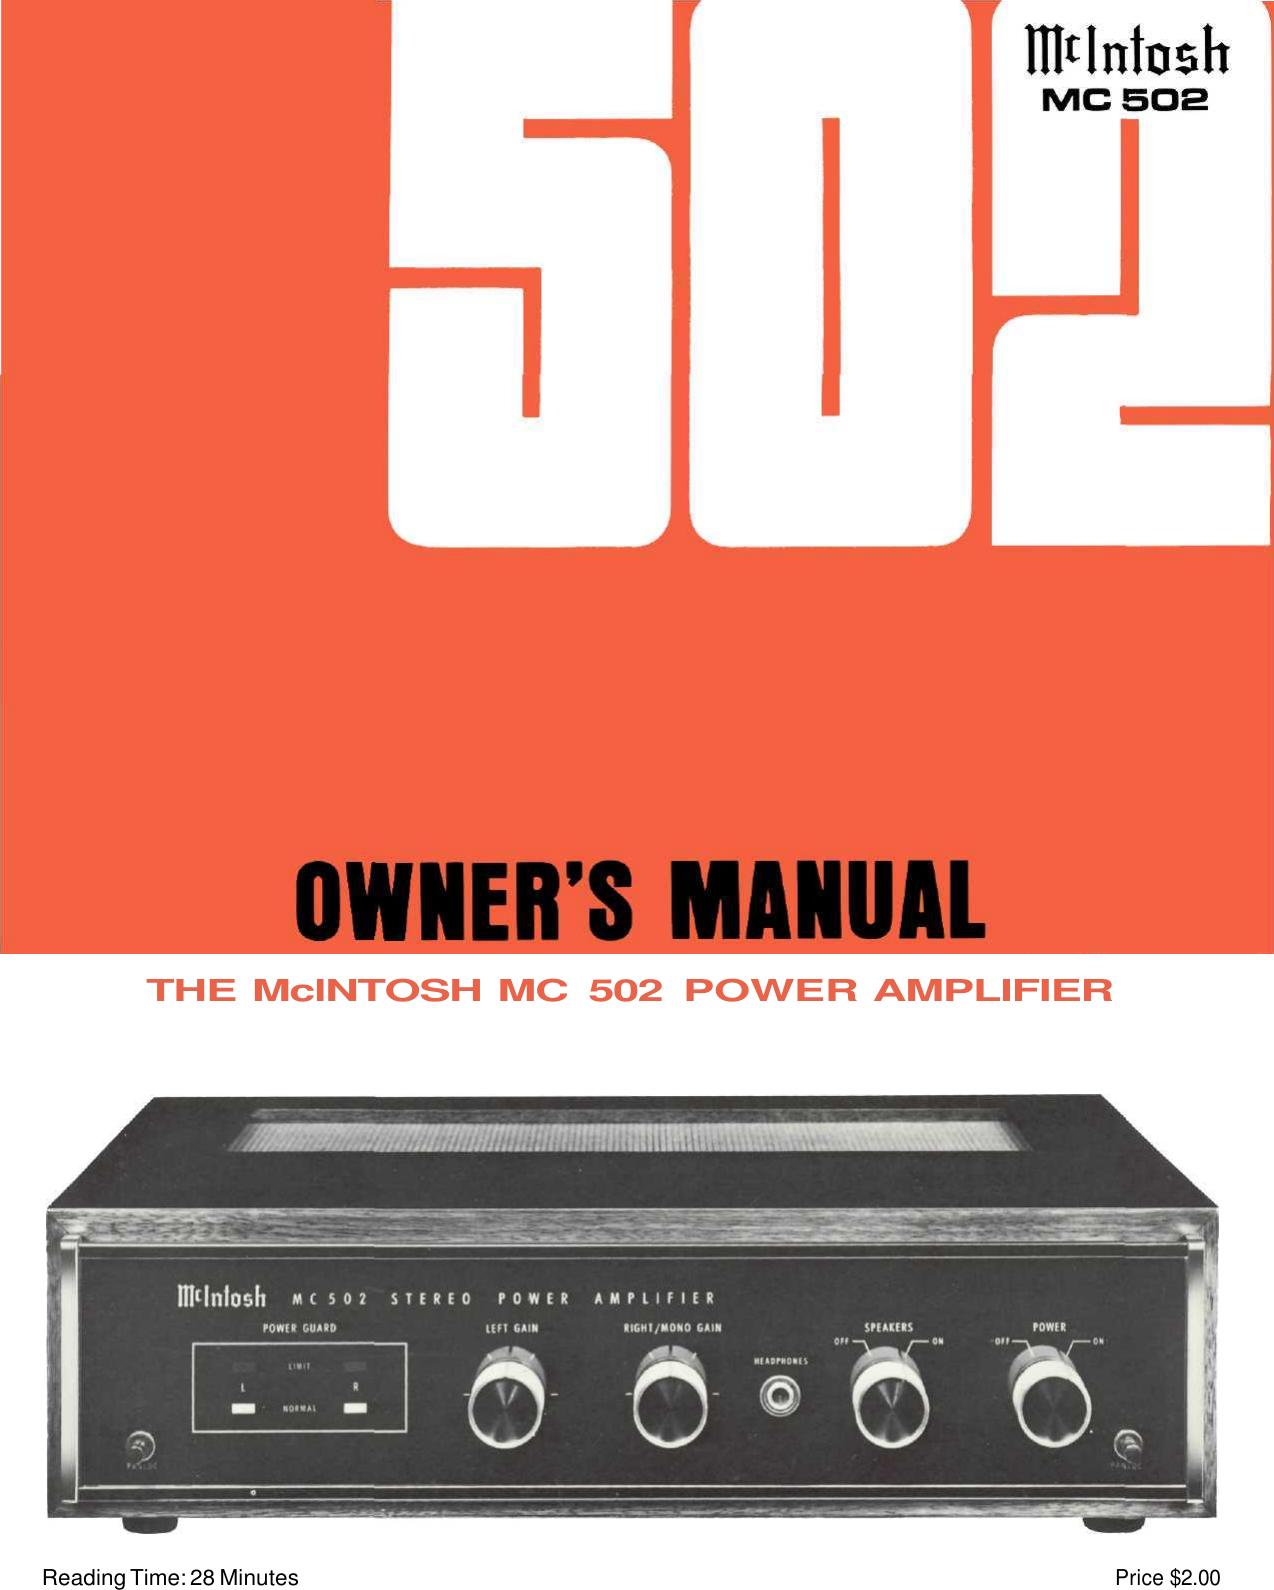 mcintosh mc 502 users manual